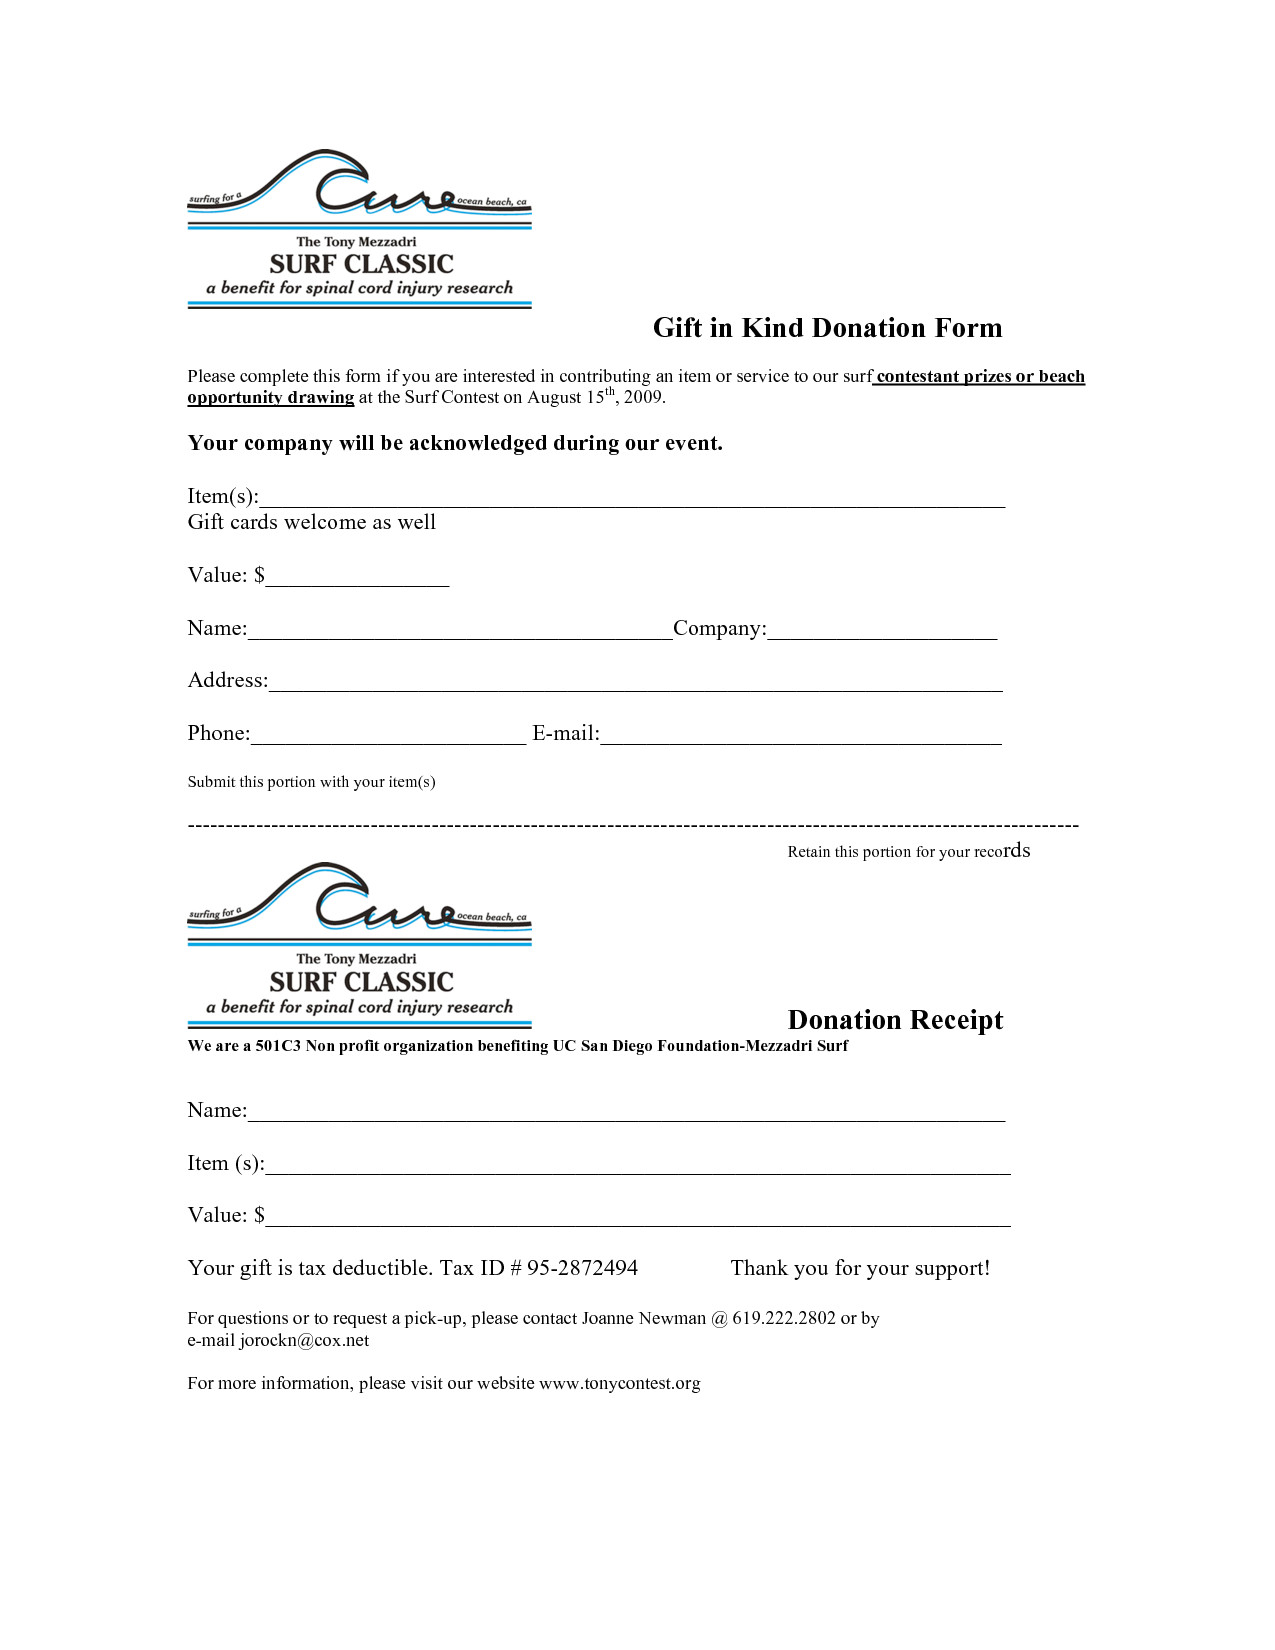 post 501c3 donation receipt template 99545